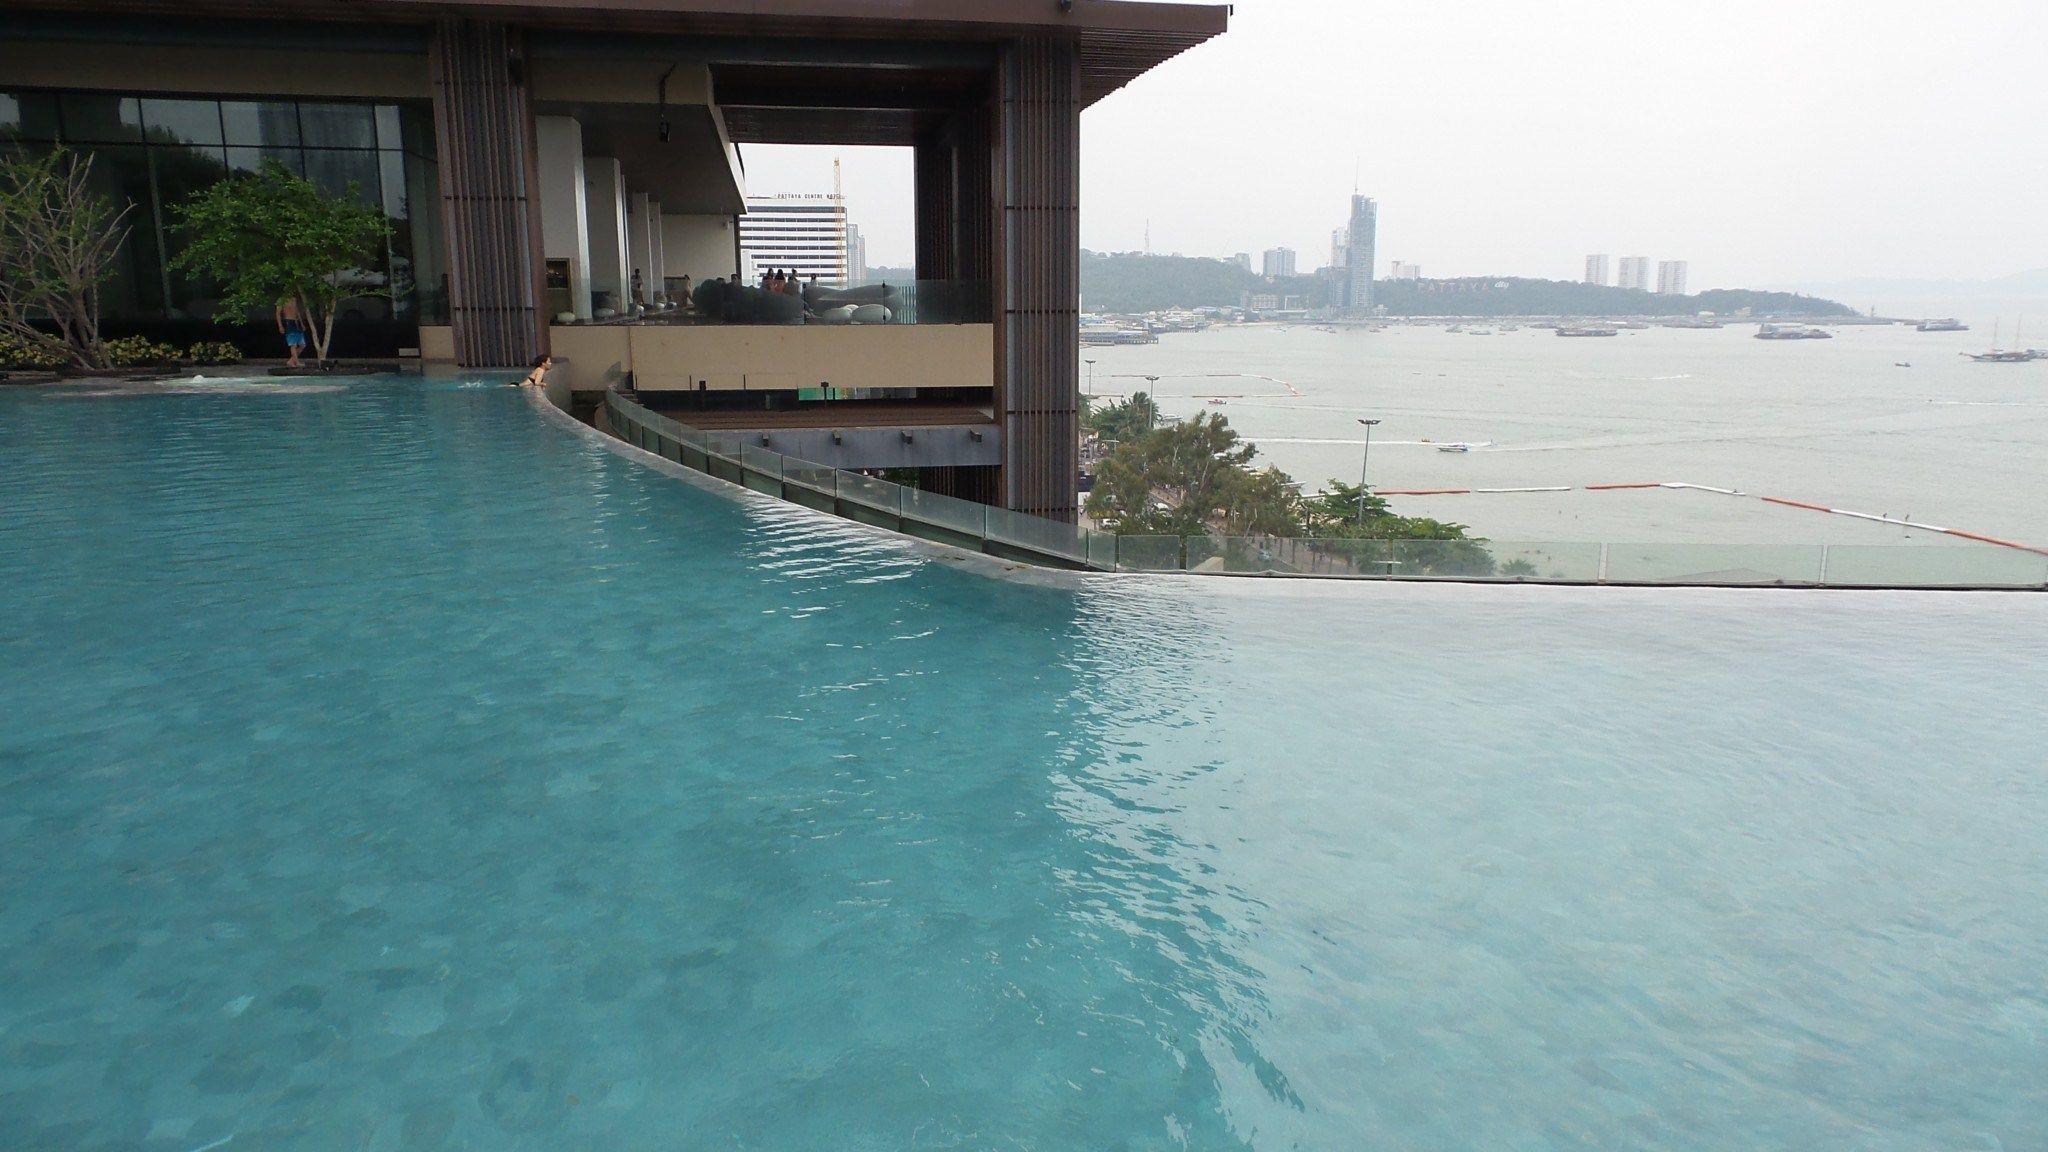 Infinity Pool at the Hilton Pattaya Hotel, Thailand | Hilton pools ...